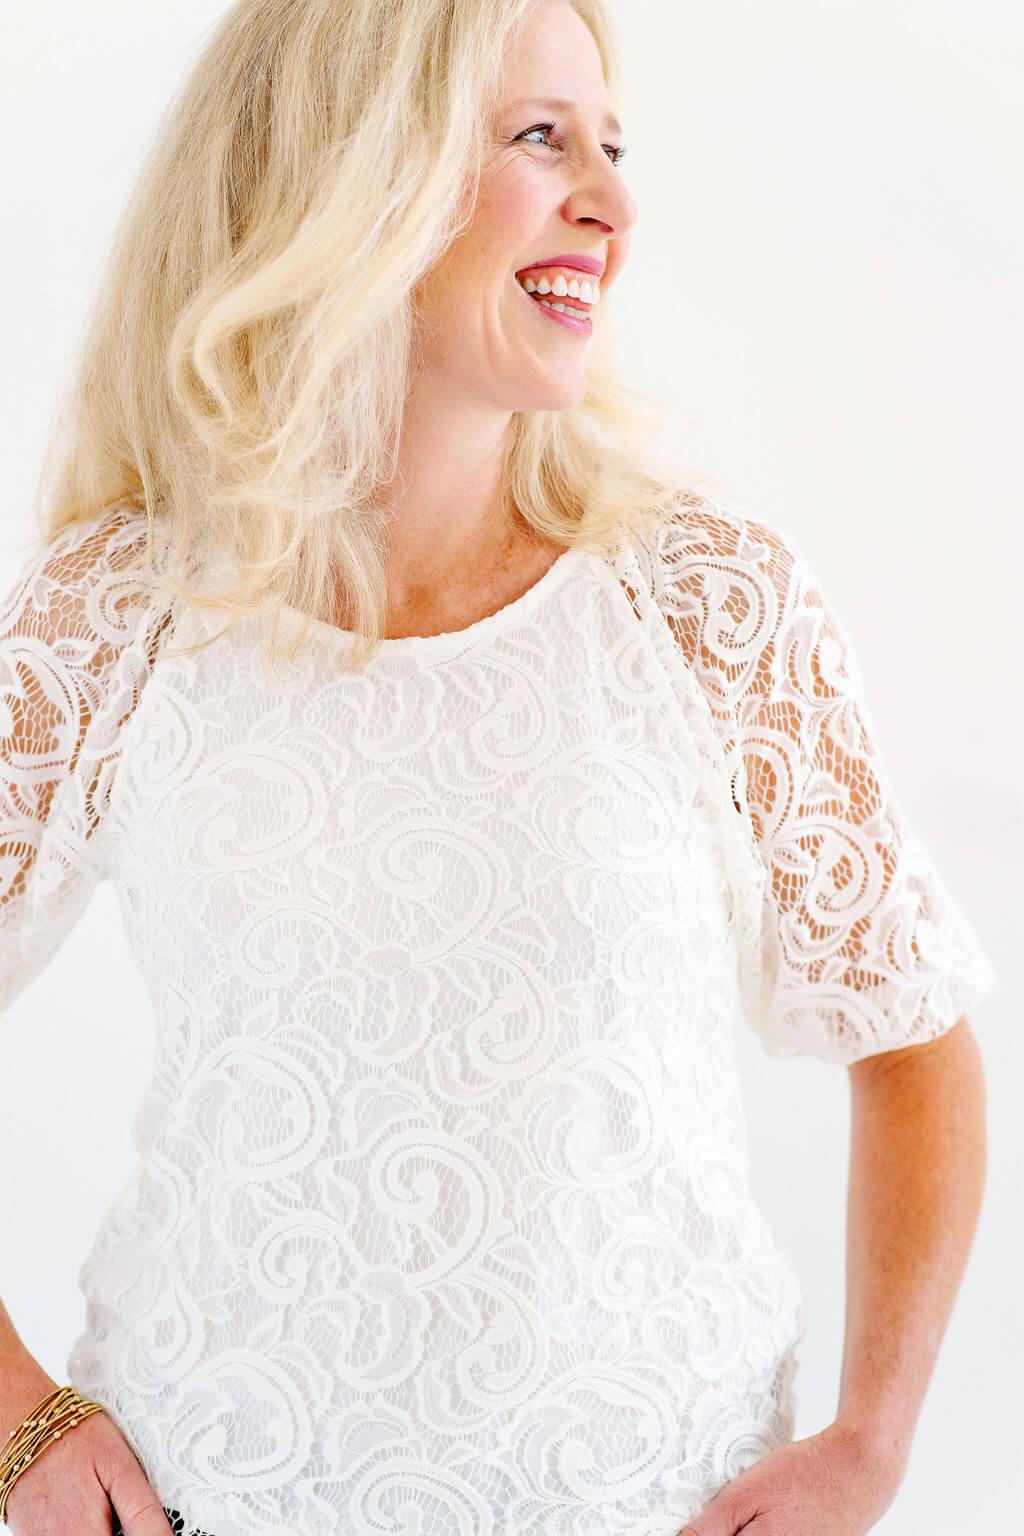 Jessica Rhoade - Cincinnati Freelance Web Designer